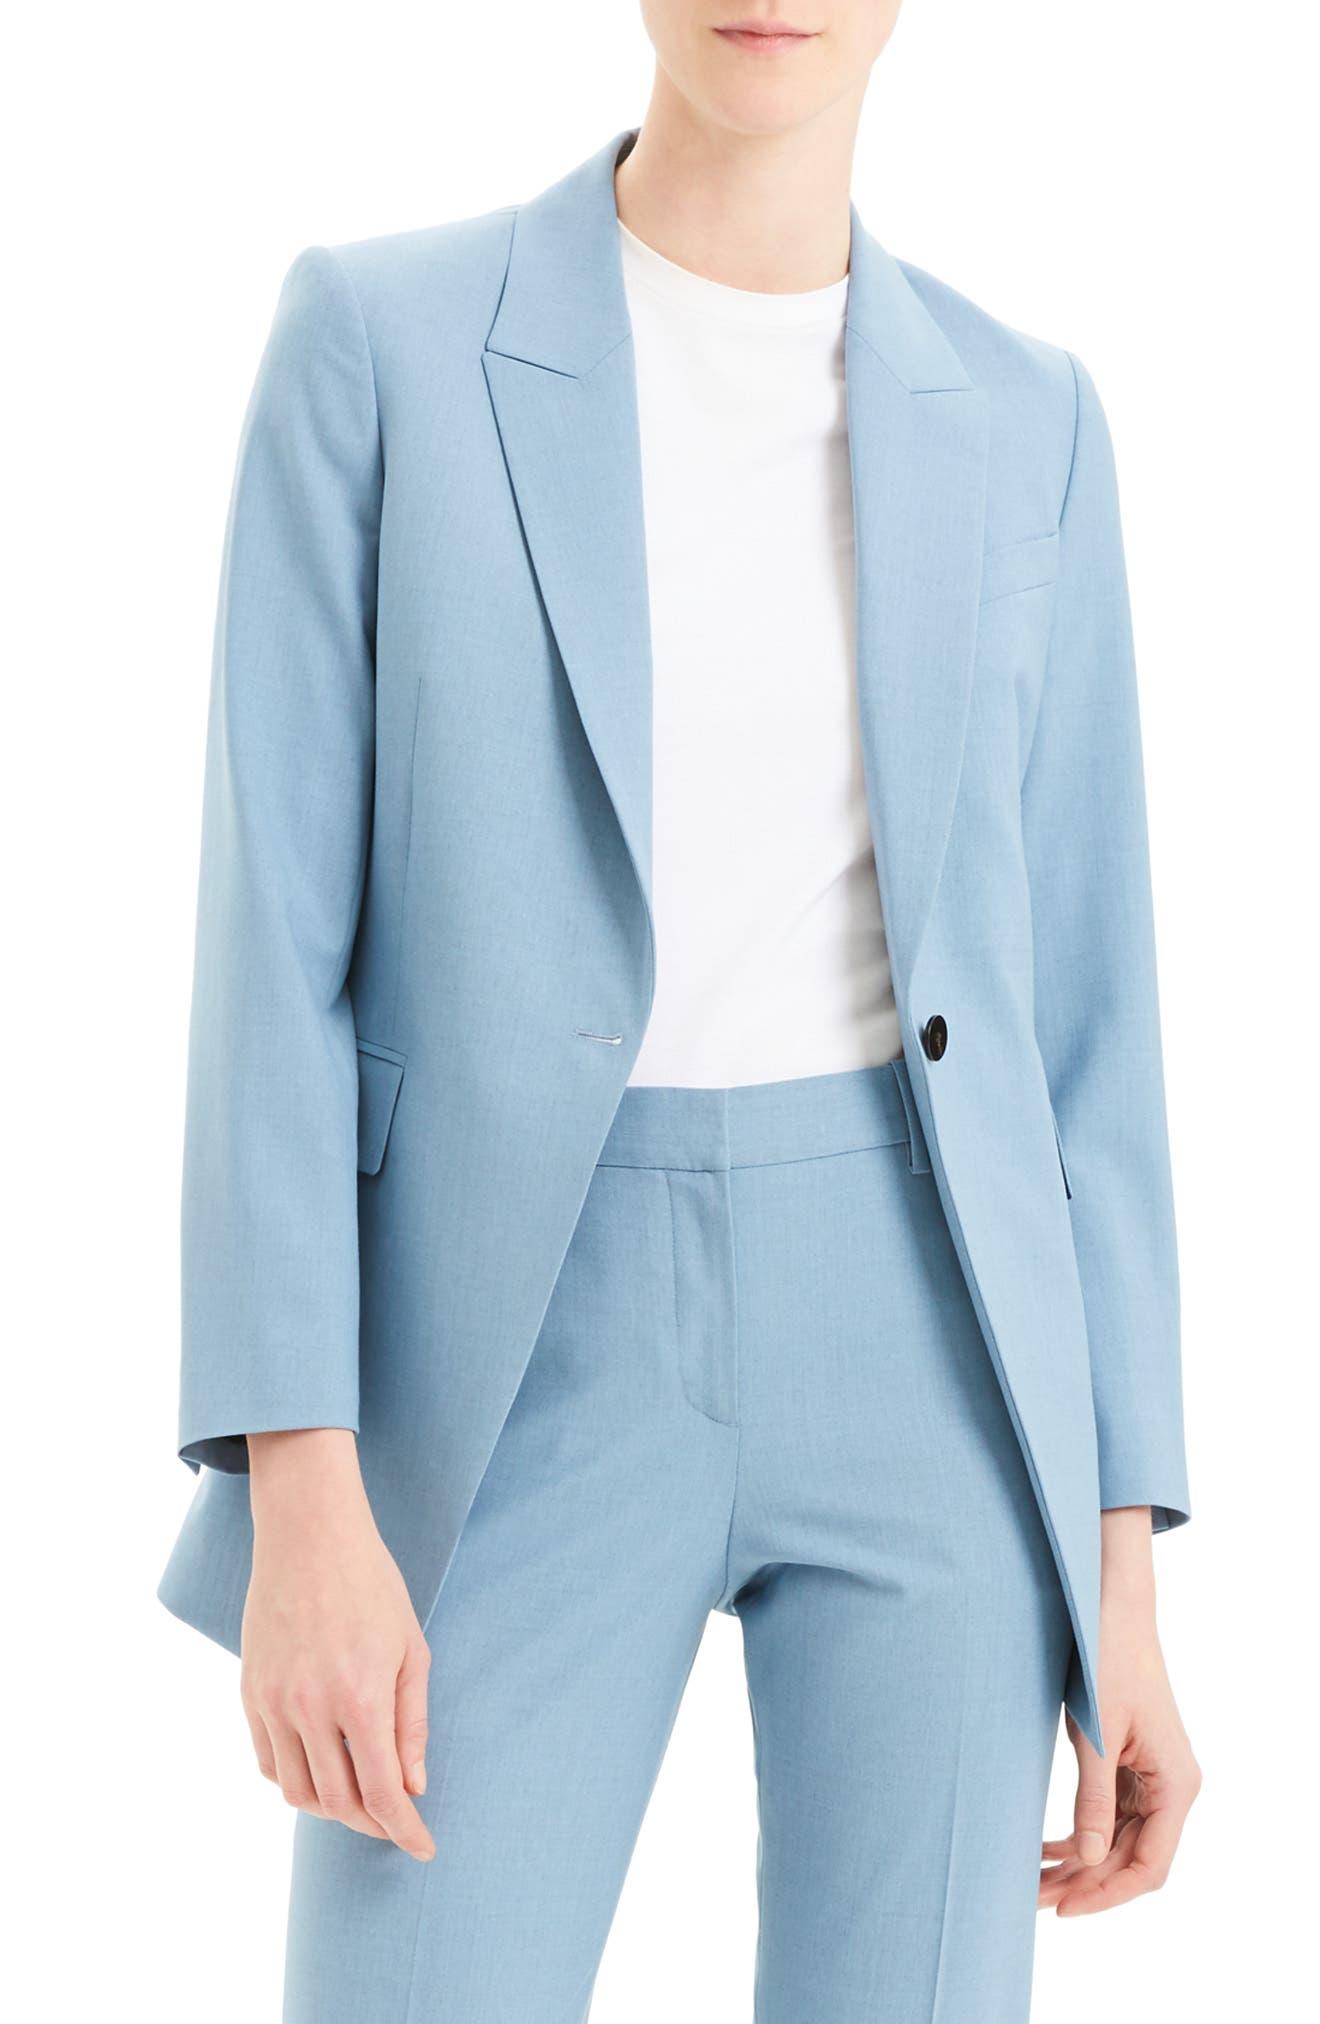 Theory Coats Etienette B Good Wool Suit Jacket